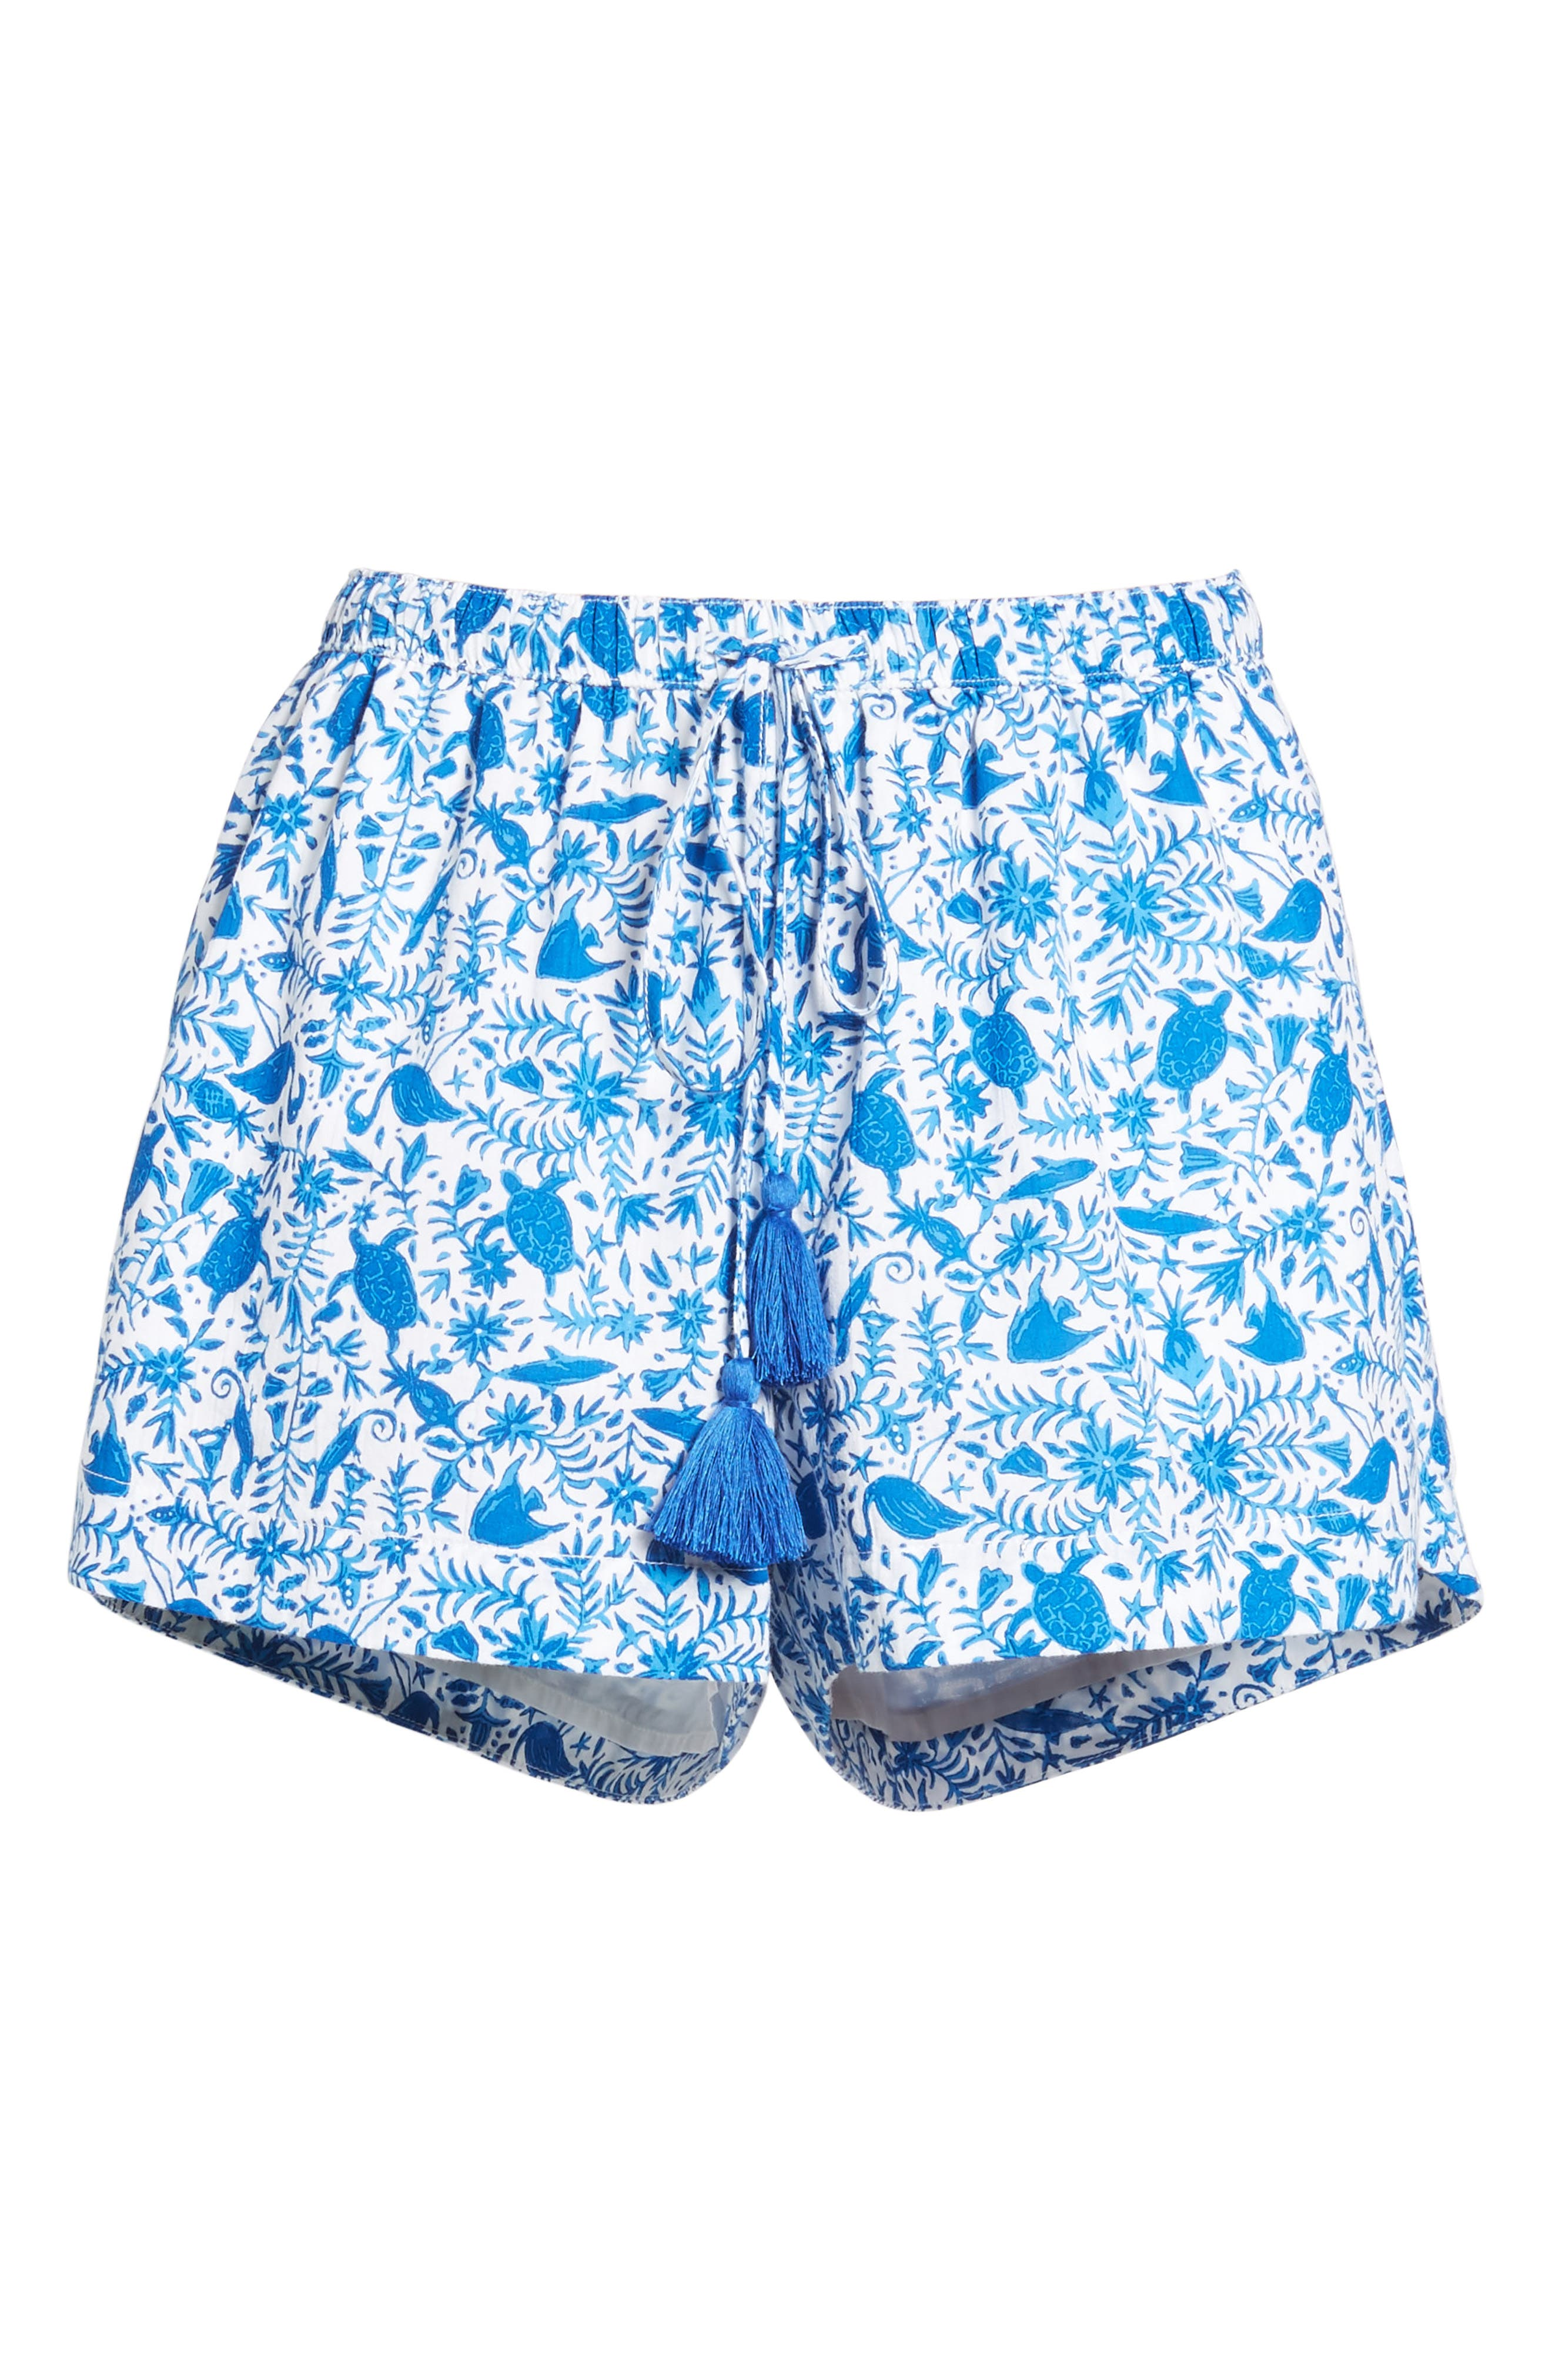 Bahamas Otomi Pull On Shorts,                             Alternate thumbnail 6, color,                             413